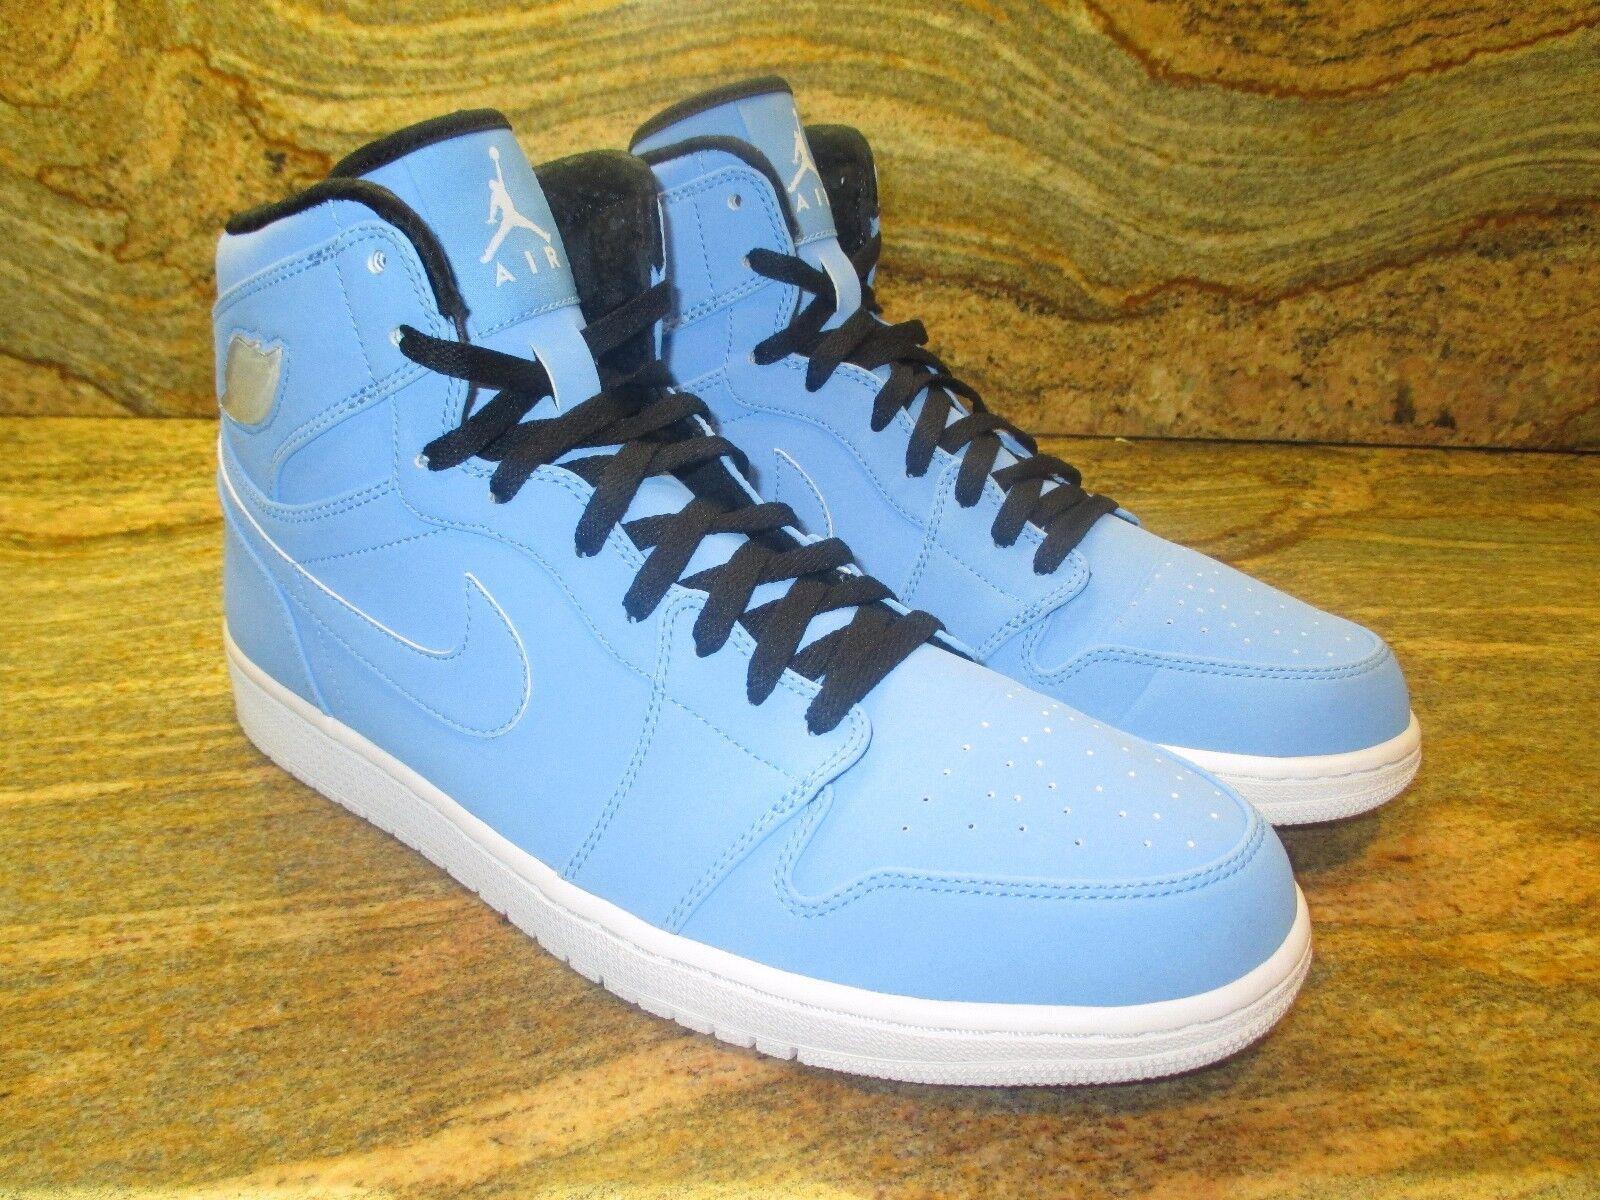 UNRELEASED Nike Air Jordan 1 Retro High 13 OG Promo Sample SZ 13 High Pantone Blue MJ PE 4c7349